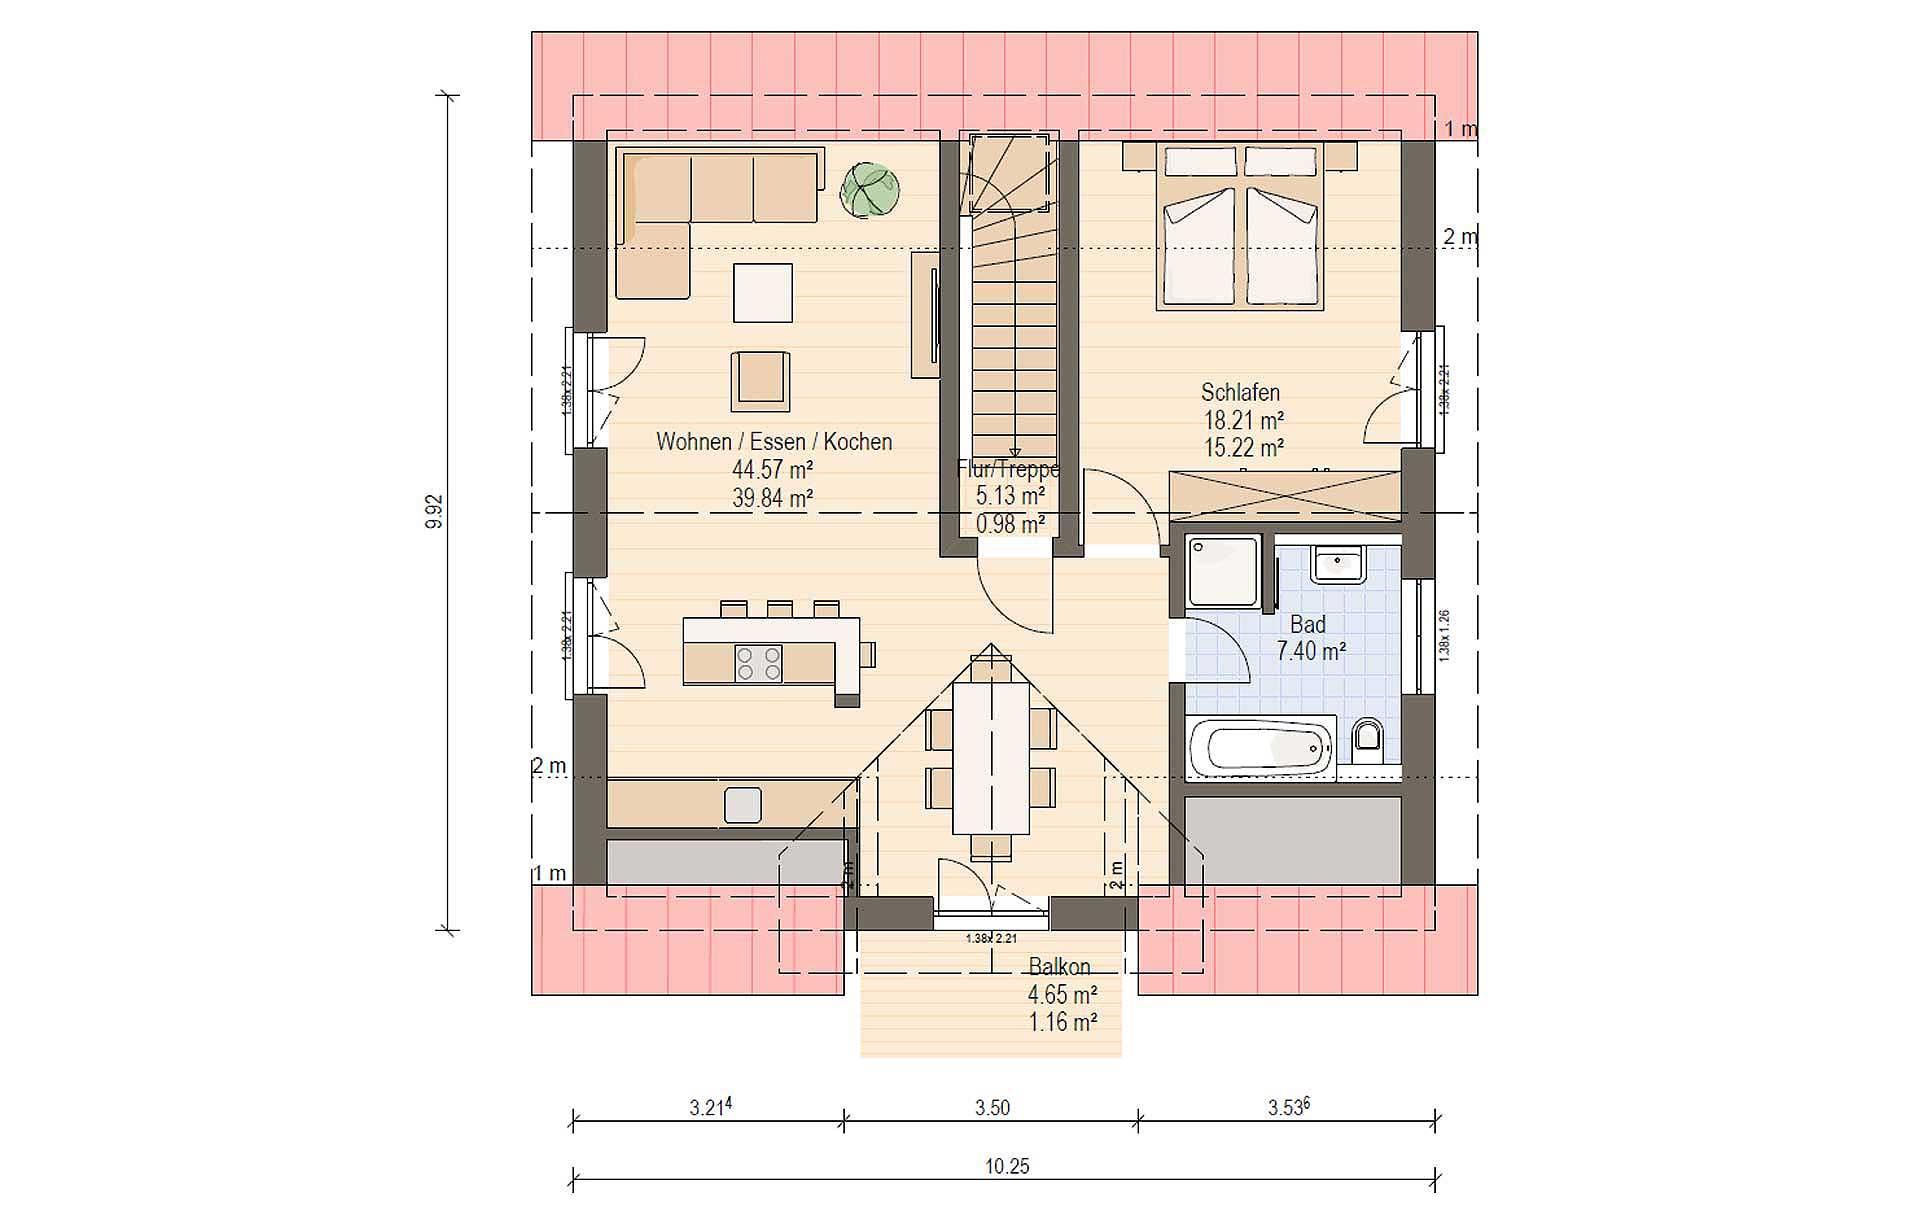 Dachgeschoss Haas Z 159 B von Haas Fertigbau GmbH